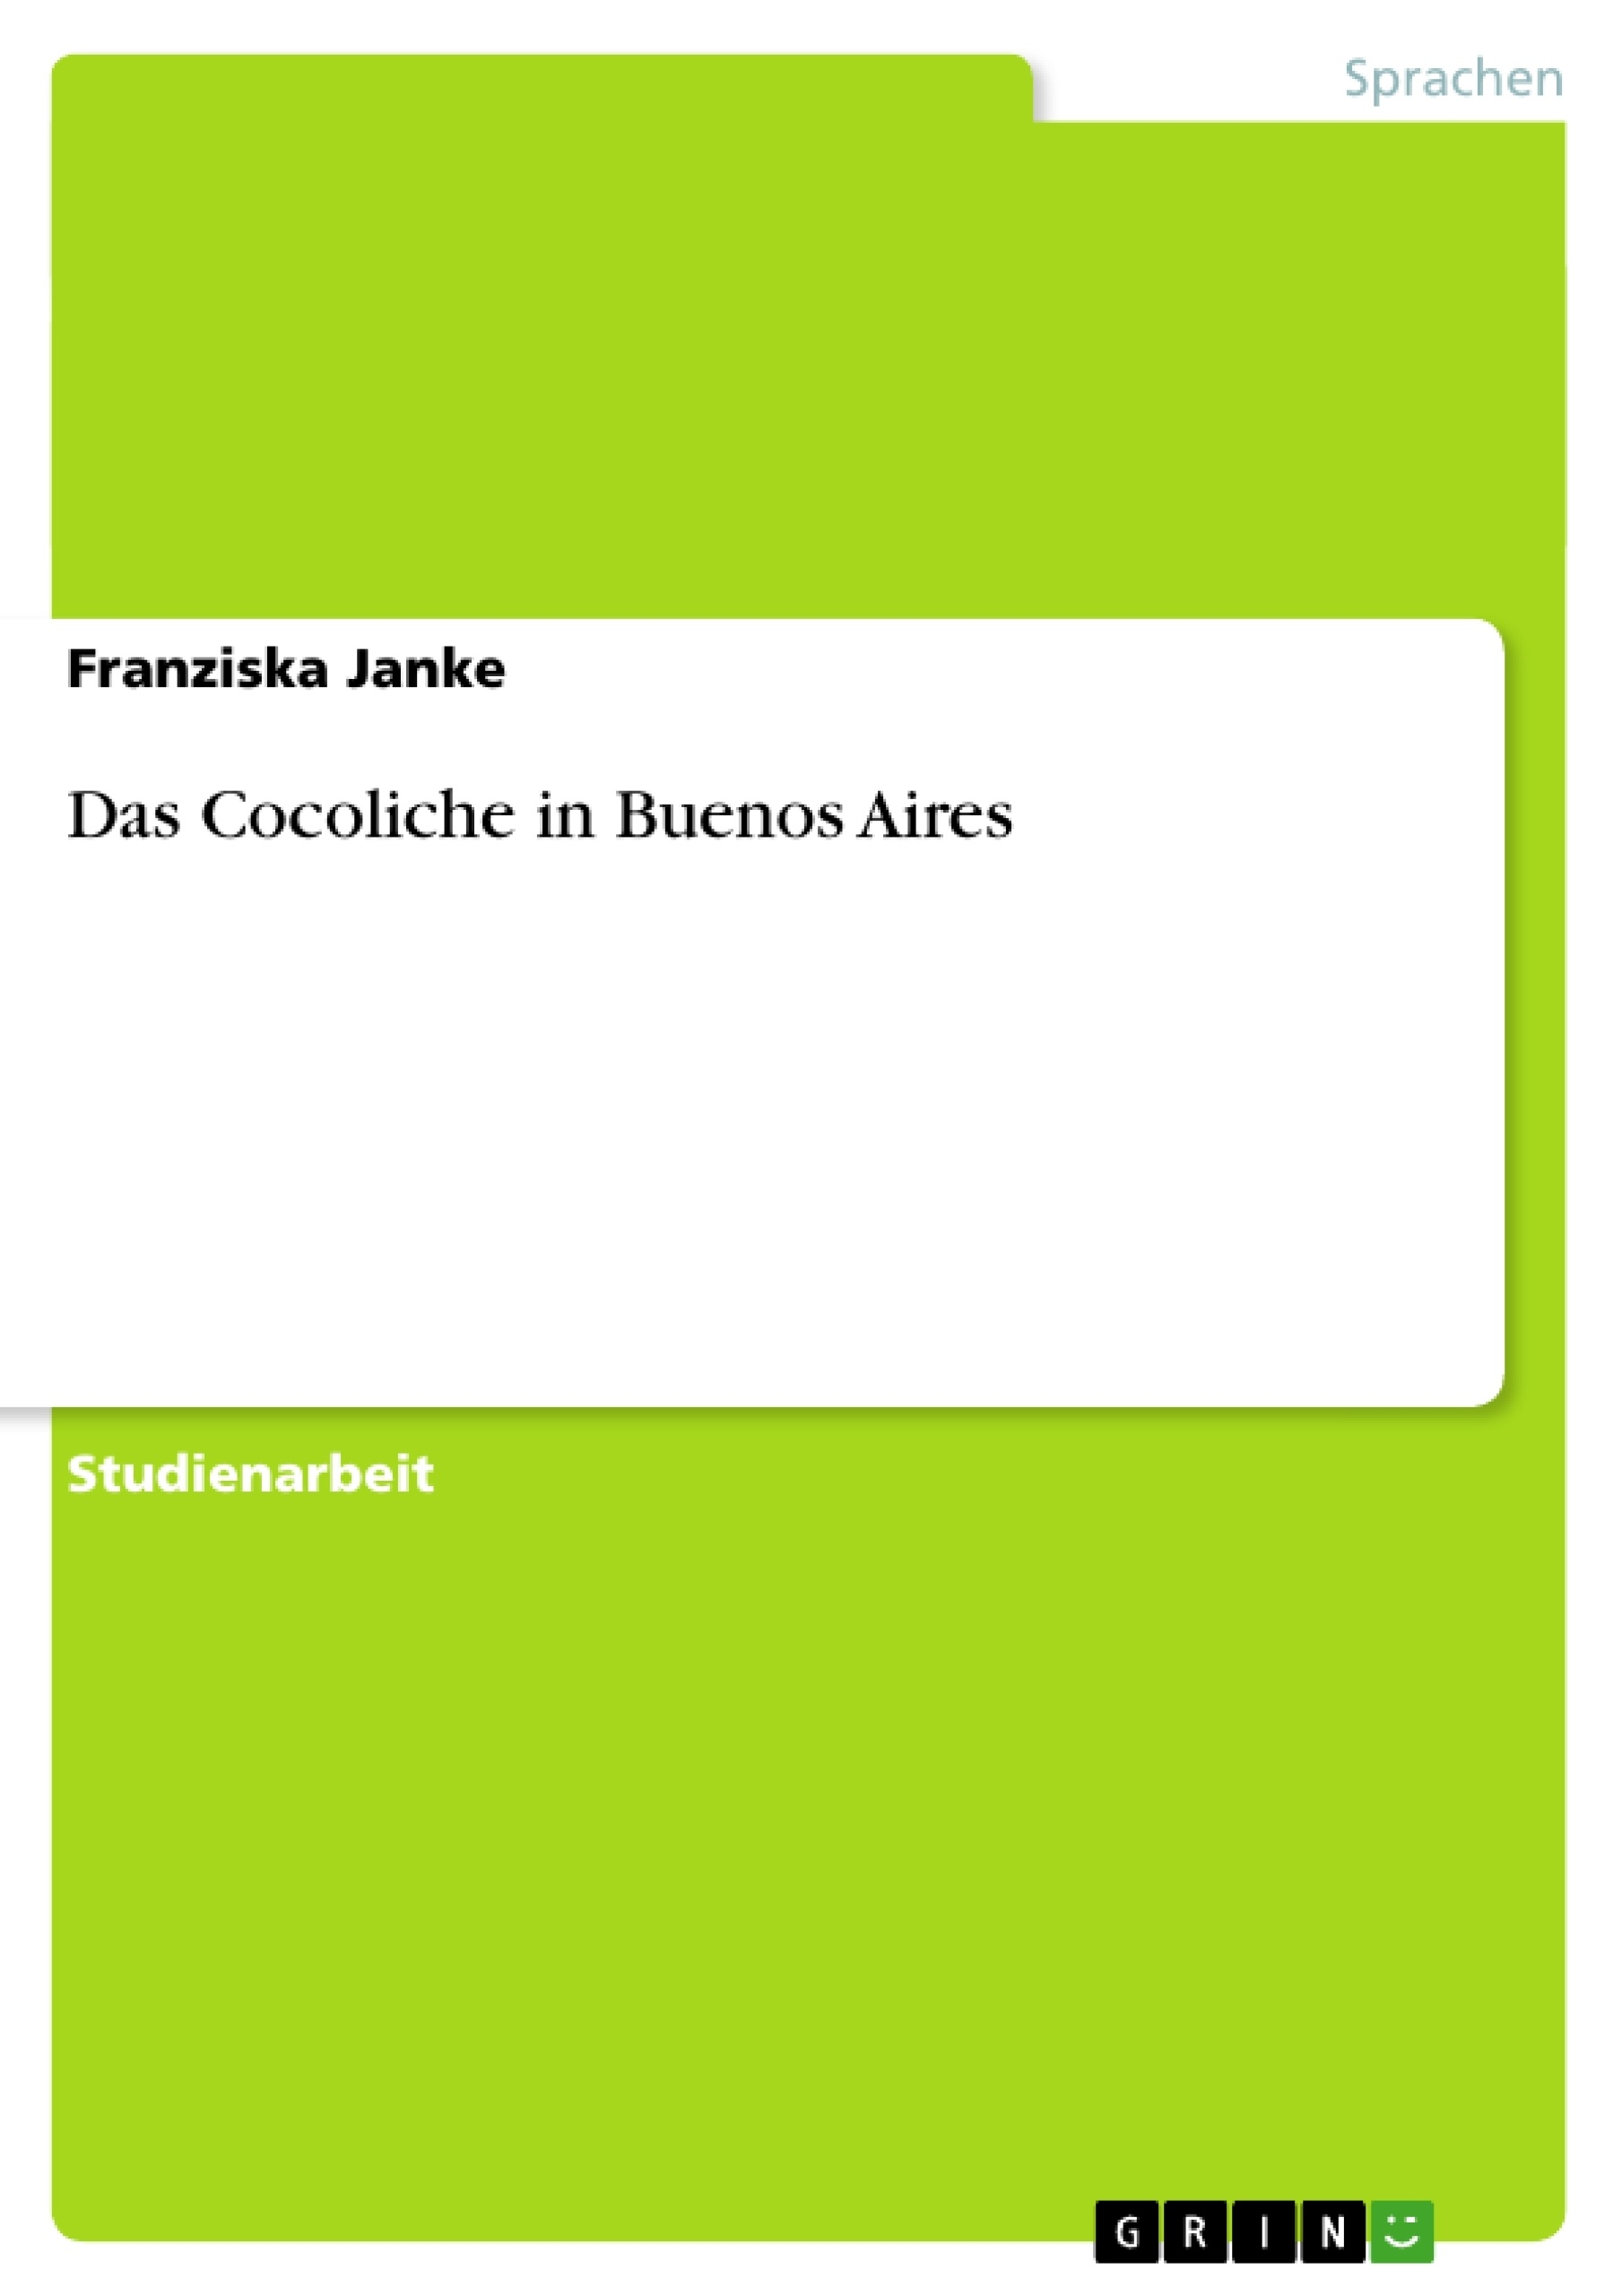 Titel: Das Cocoliche in Buenos Aires